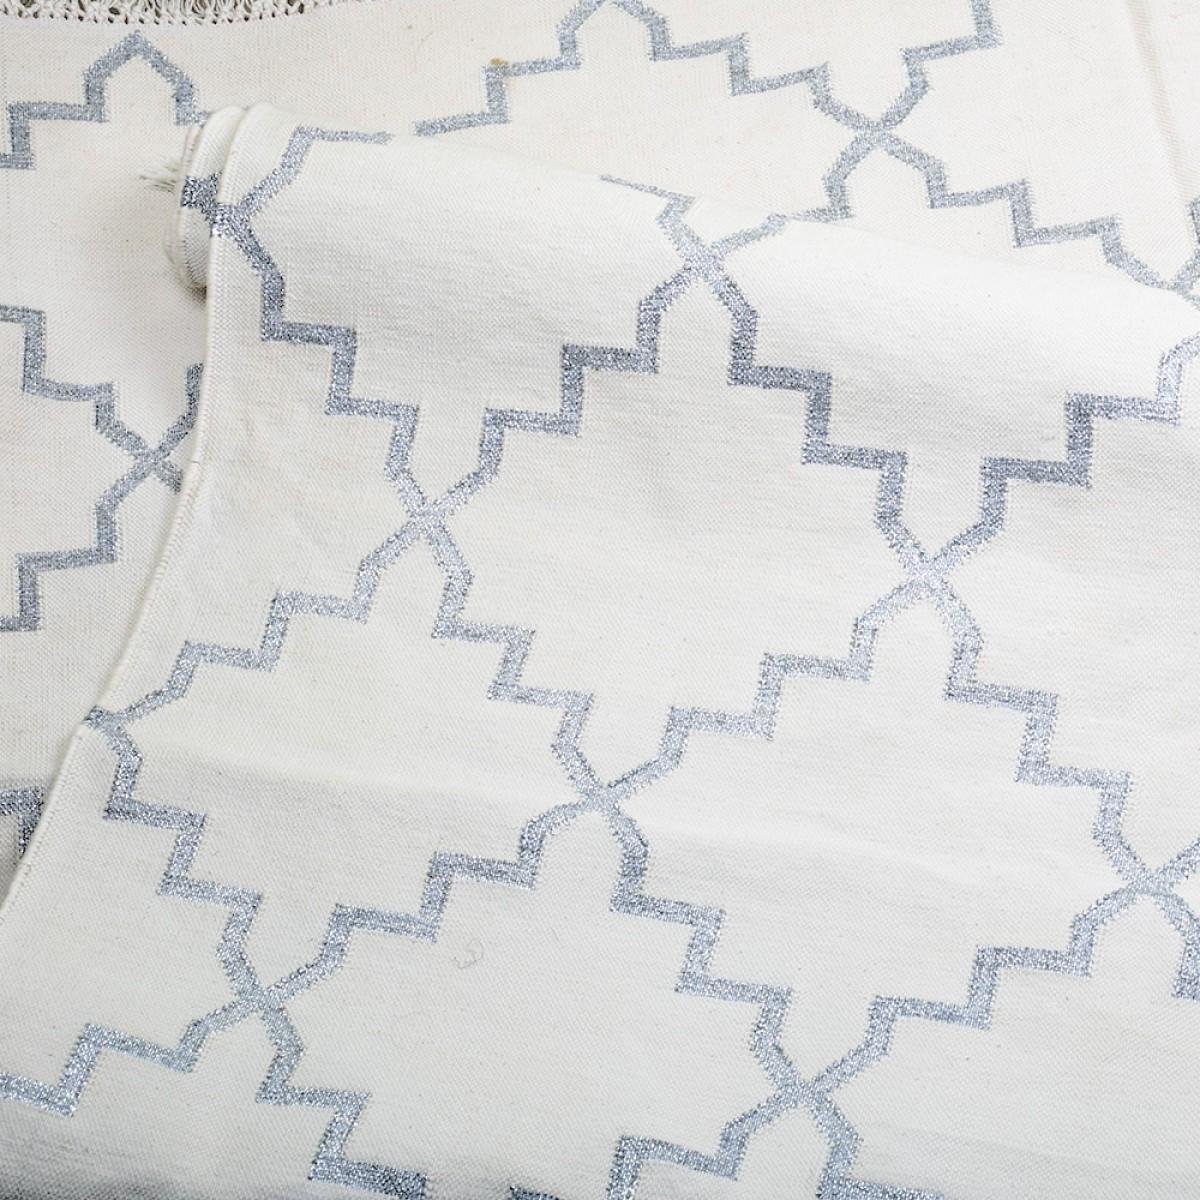 Cotton Floor Rugs - White